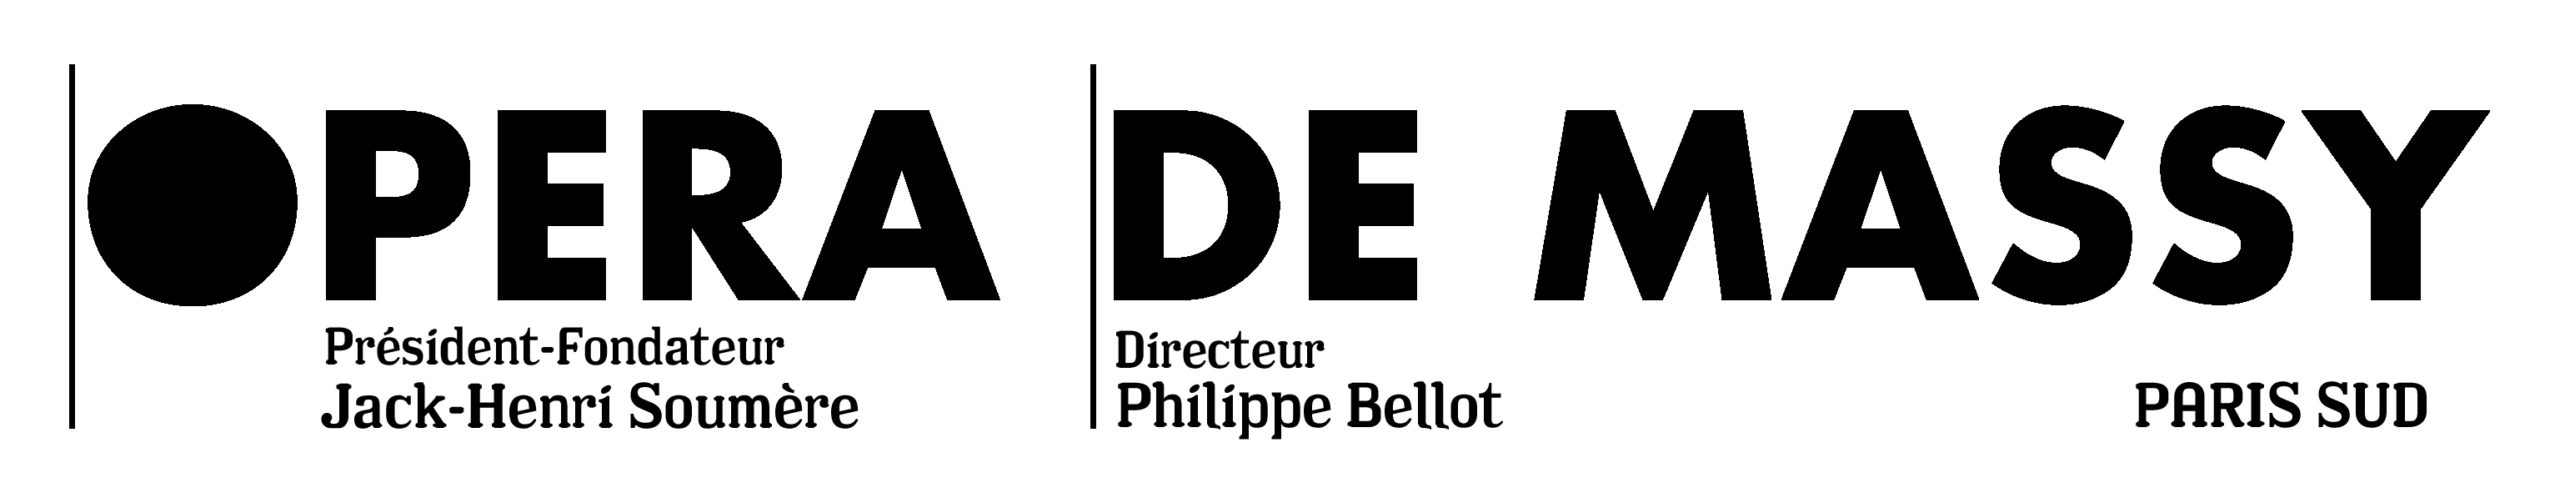 Logo de l'Opéra de Massy